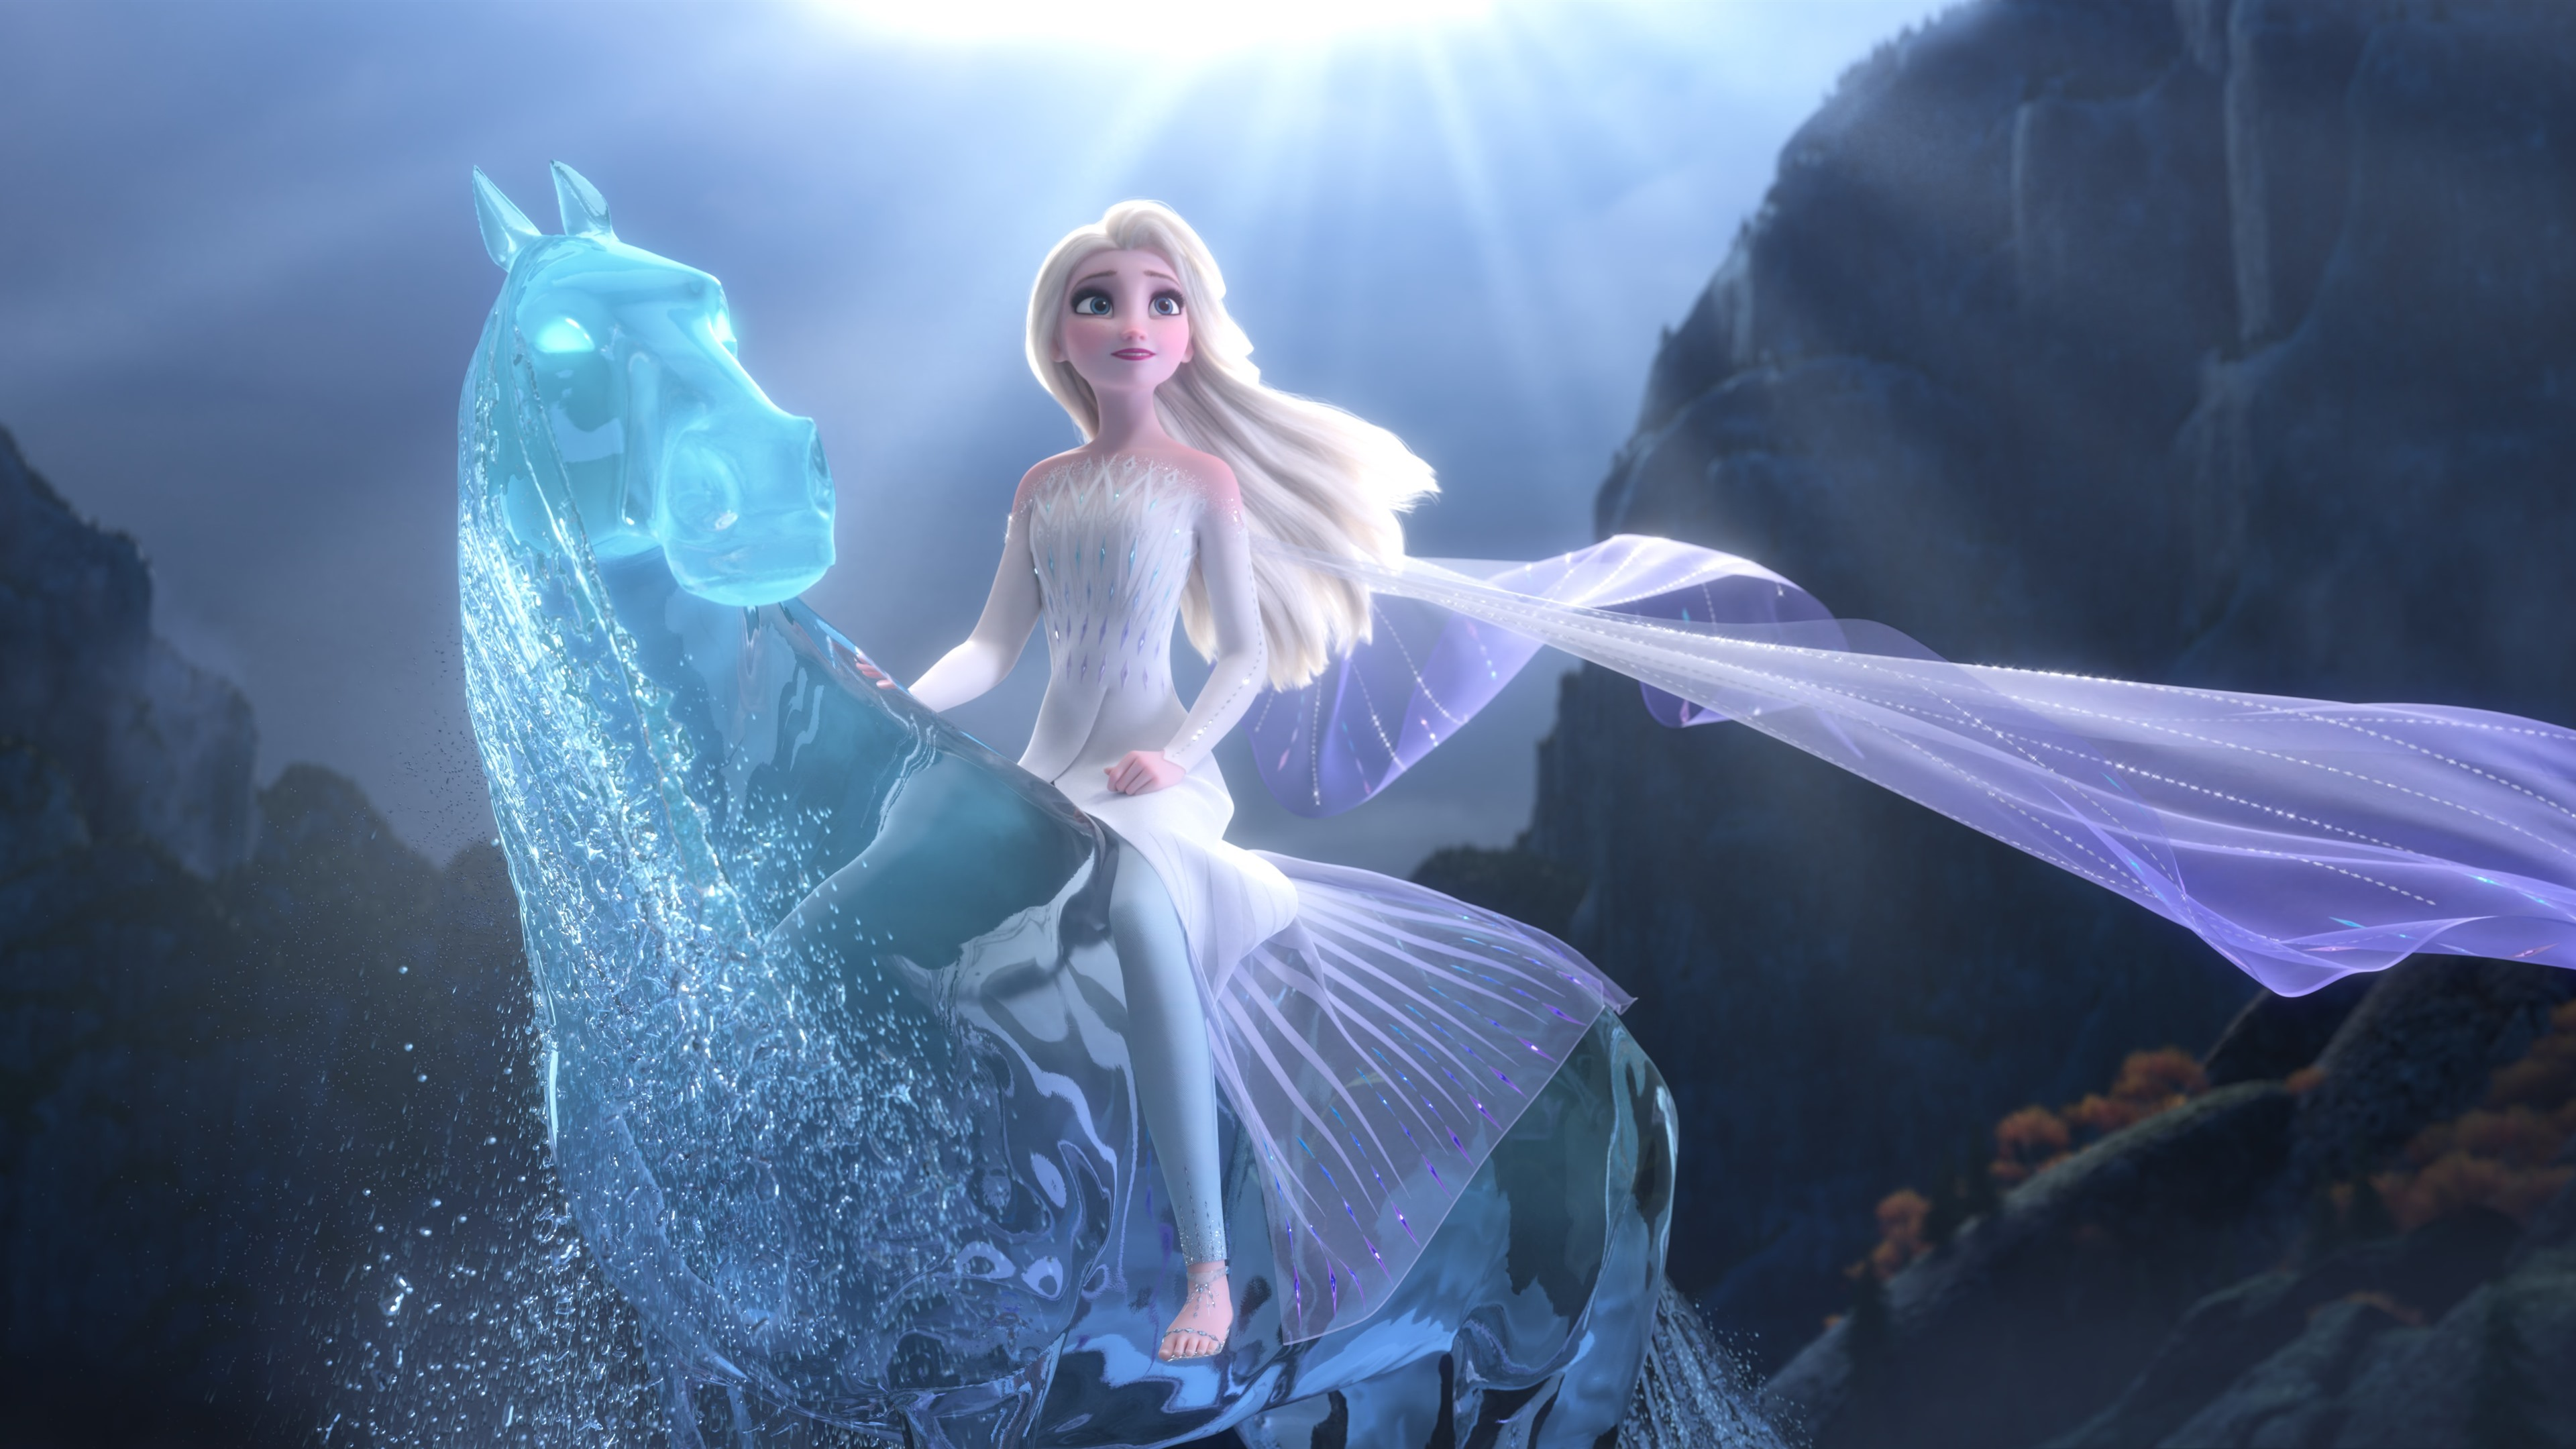 Wallpaper Elsa, Frozen 2, magic water horse 3840x2160 UHD ...